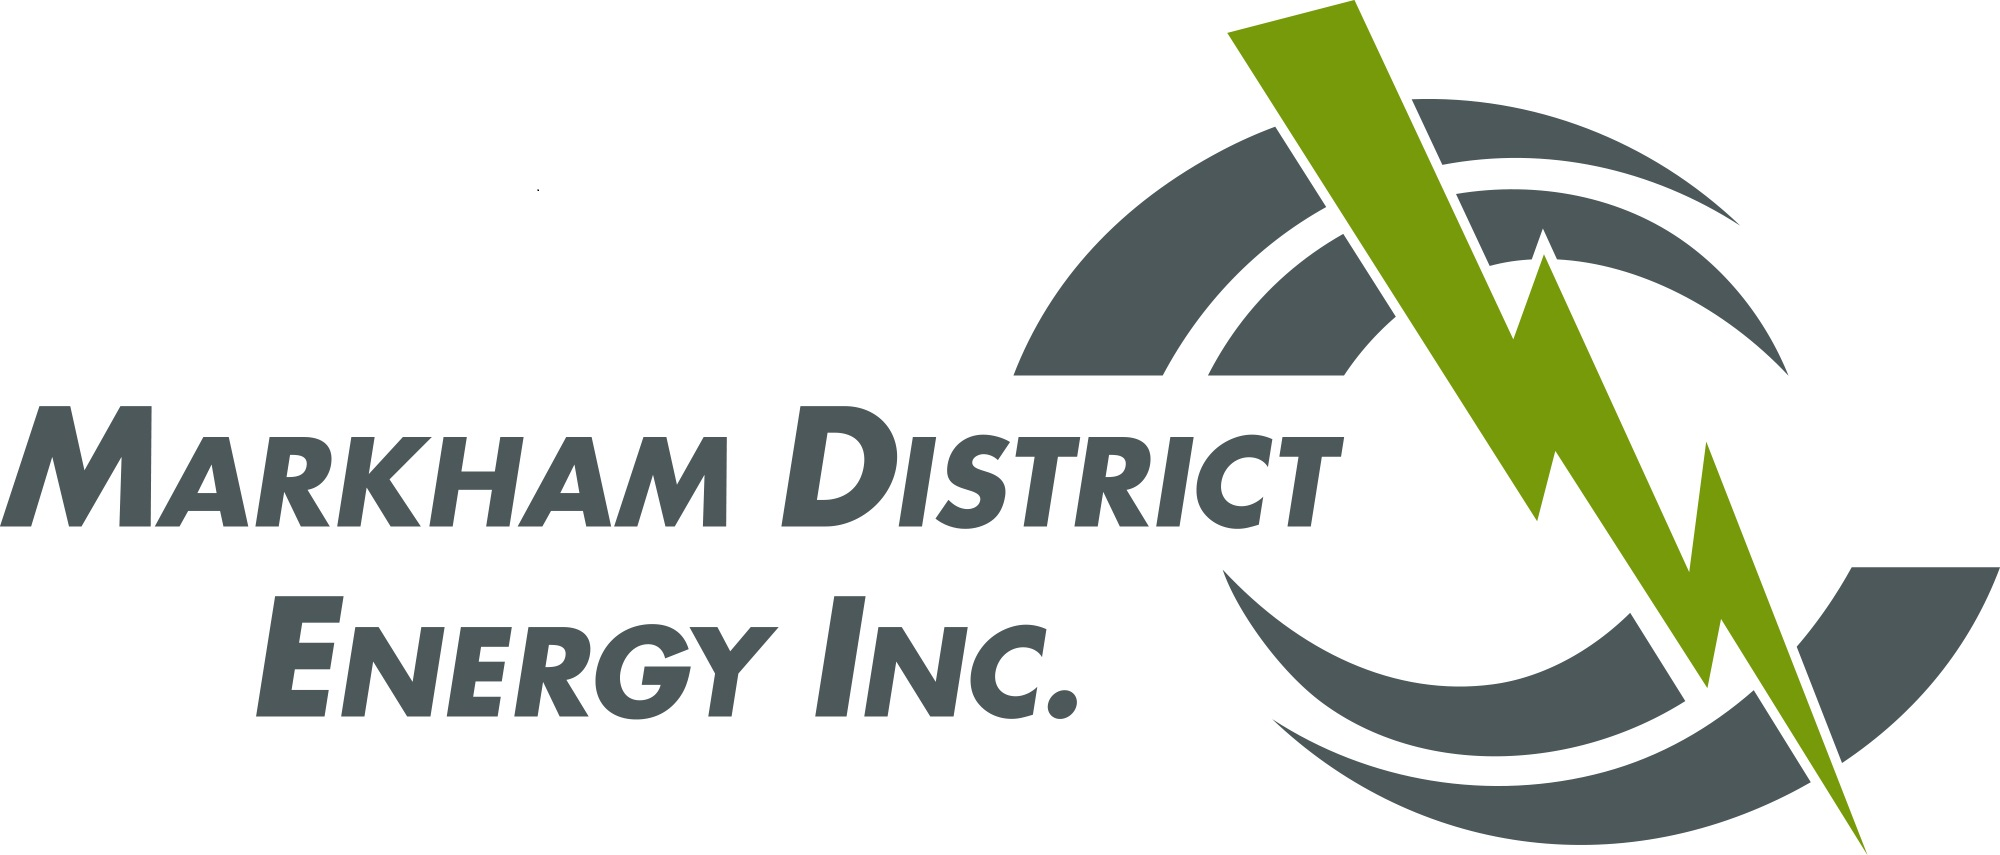 Markham District Energy